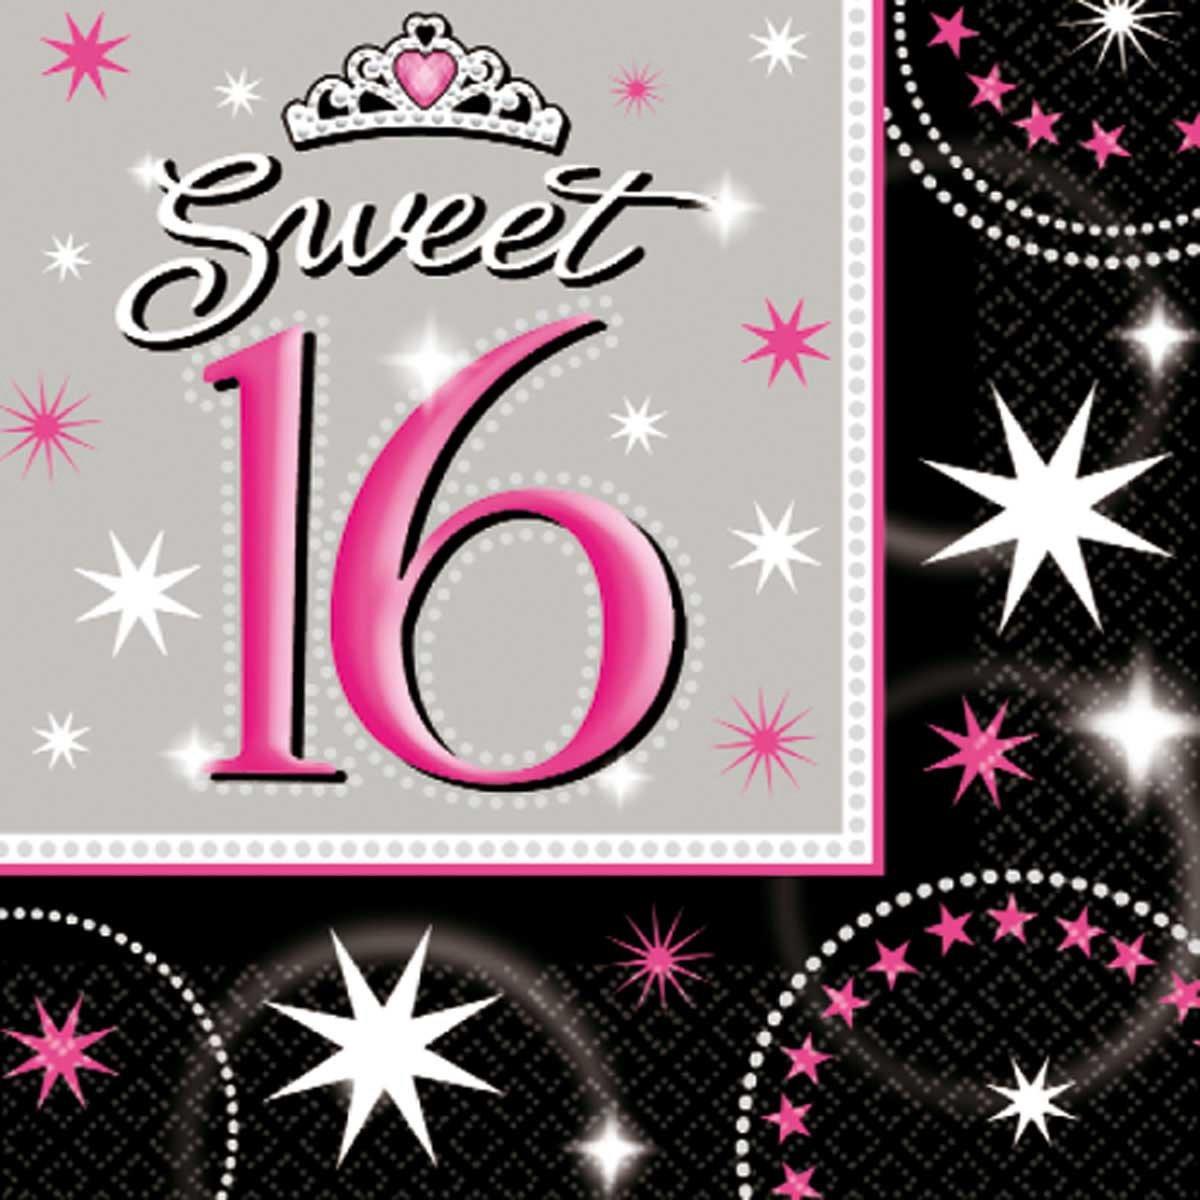 Sweet 16 Servetten - 16 stuks